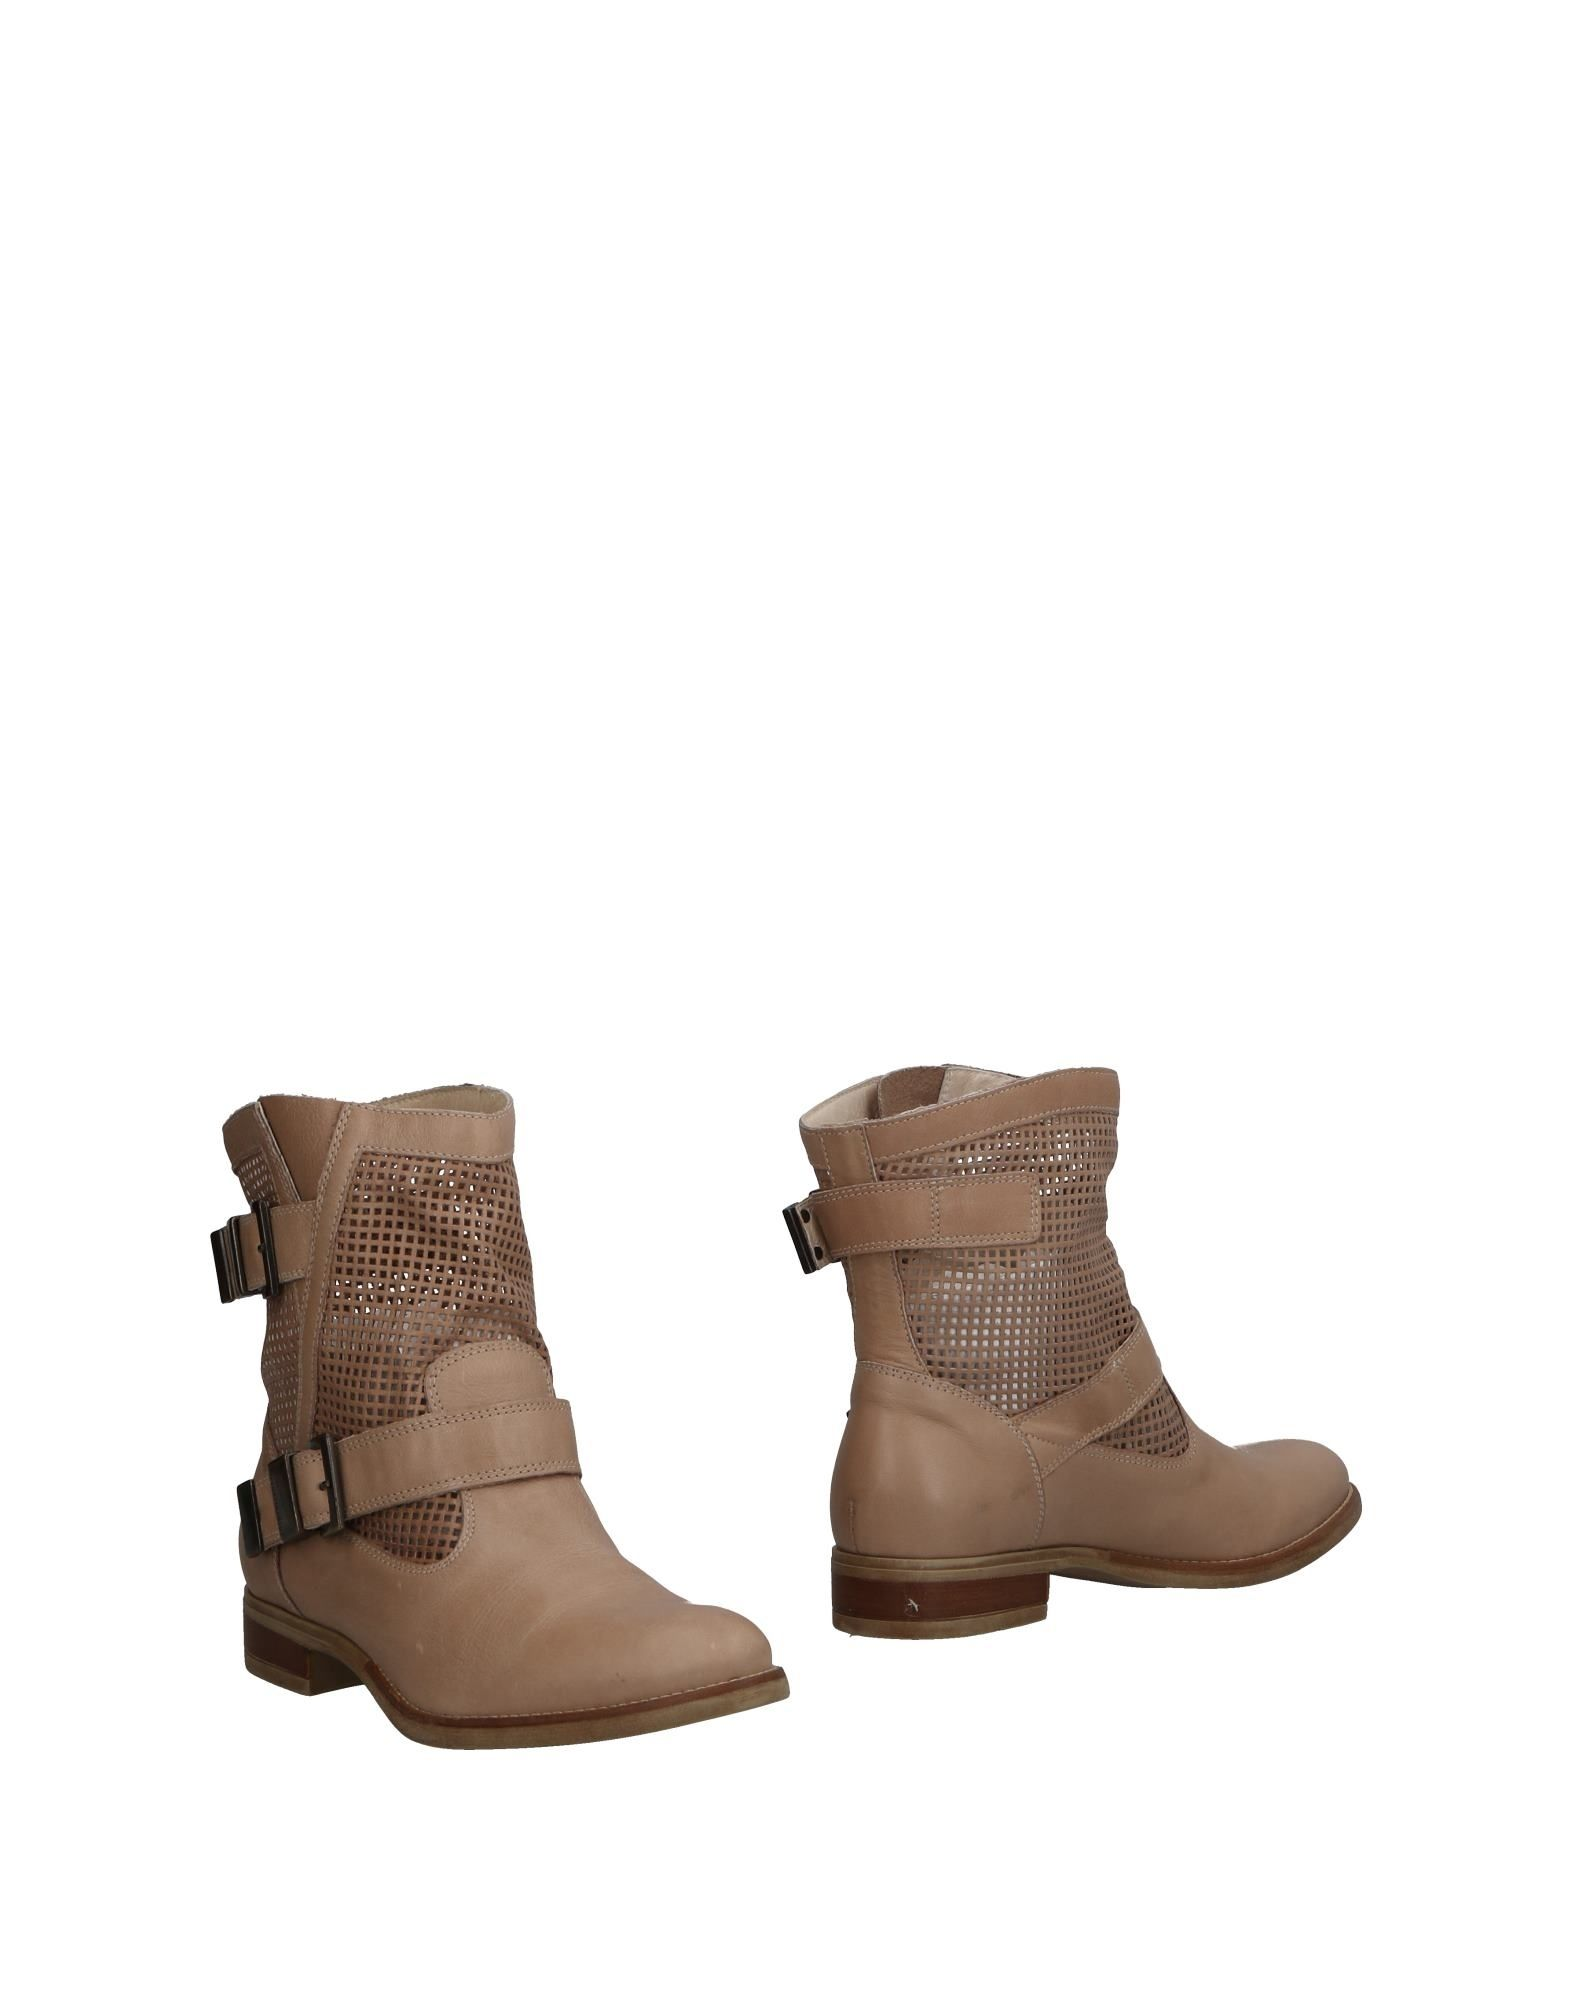 Nero Giardini Stiefelette Damen  11483819OA Gute Qualität beliebte Schuhe